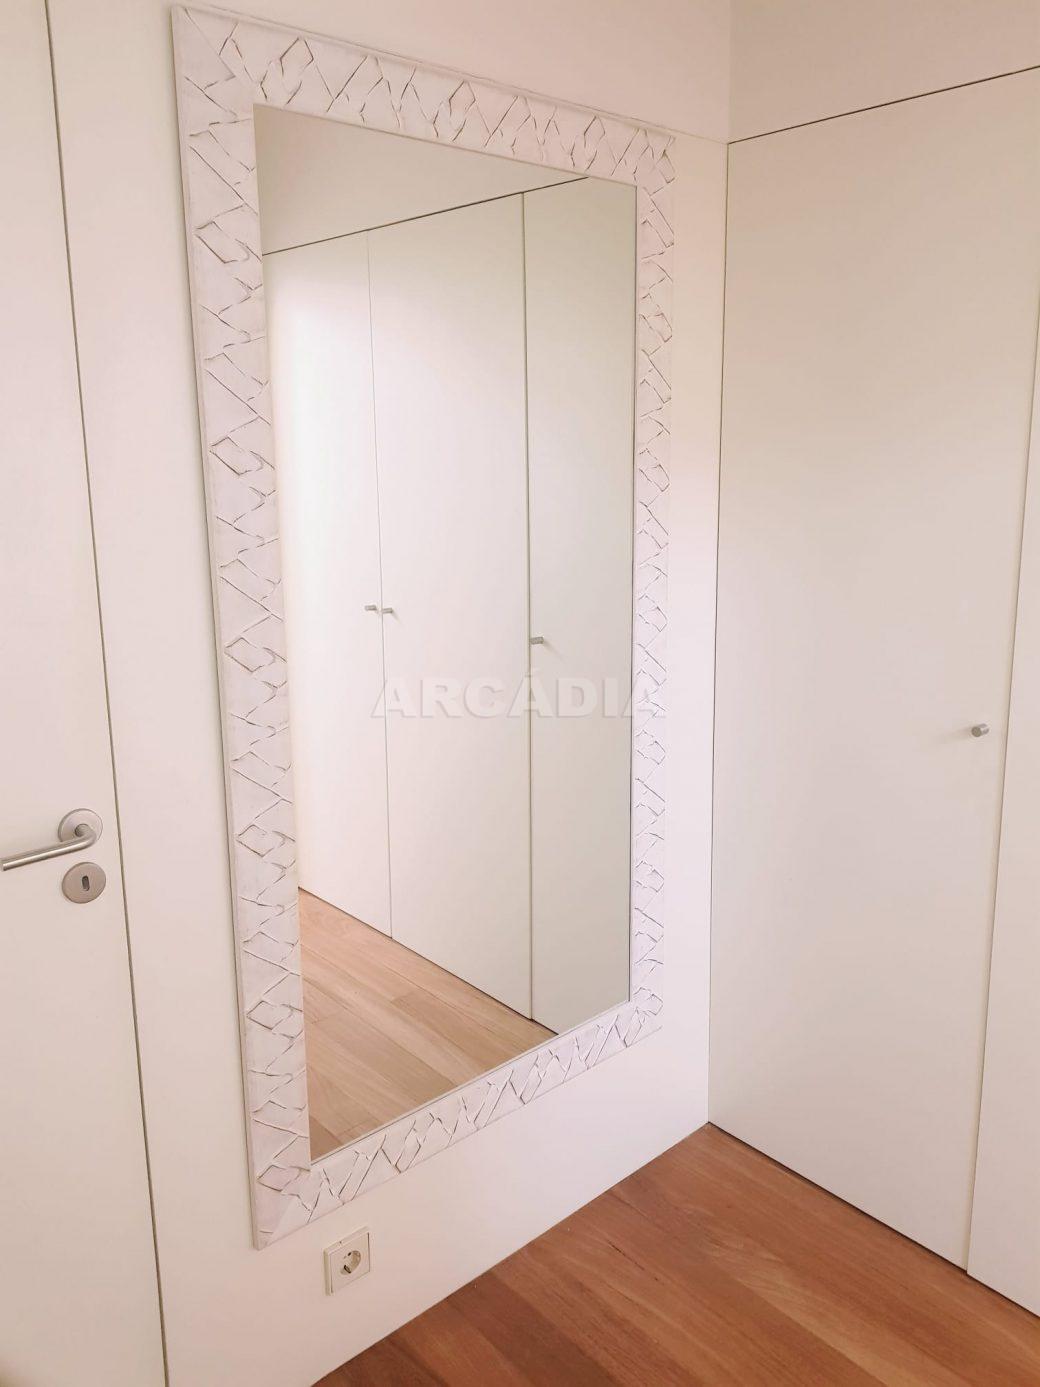 arcadia-imobiliaria-braga-apartamento-no-centro-historico-de-braga-tipo-2-para-compra-7